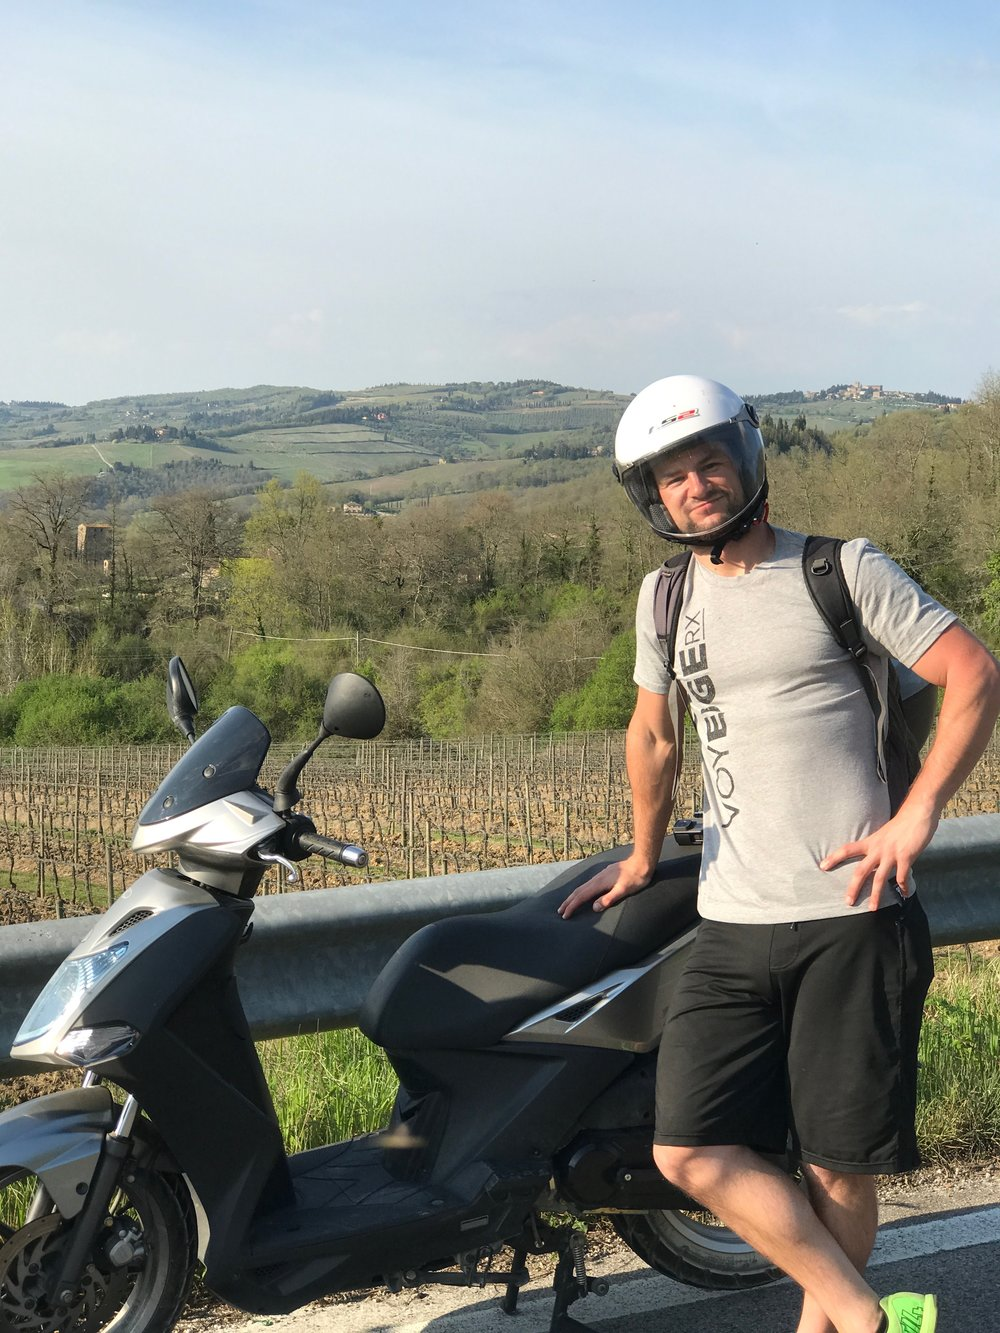 Proof of Tony riding a vespa in Chianti